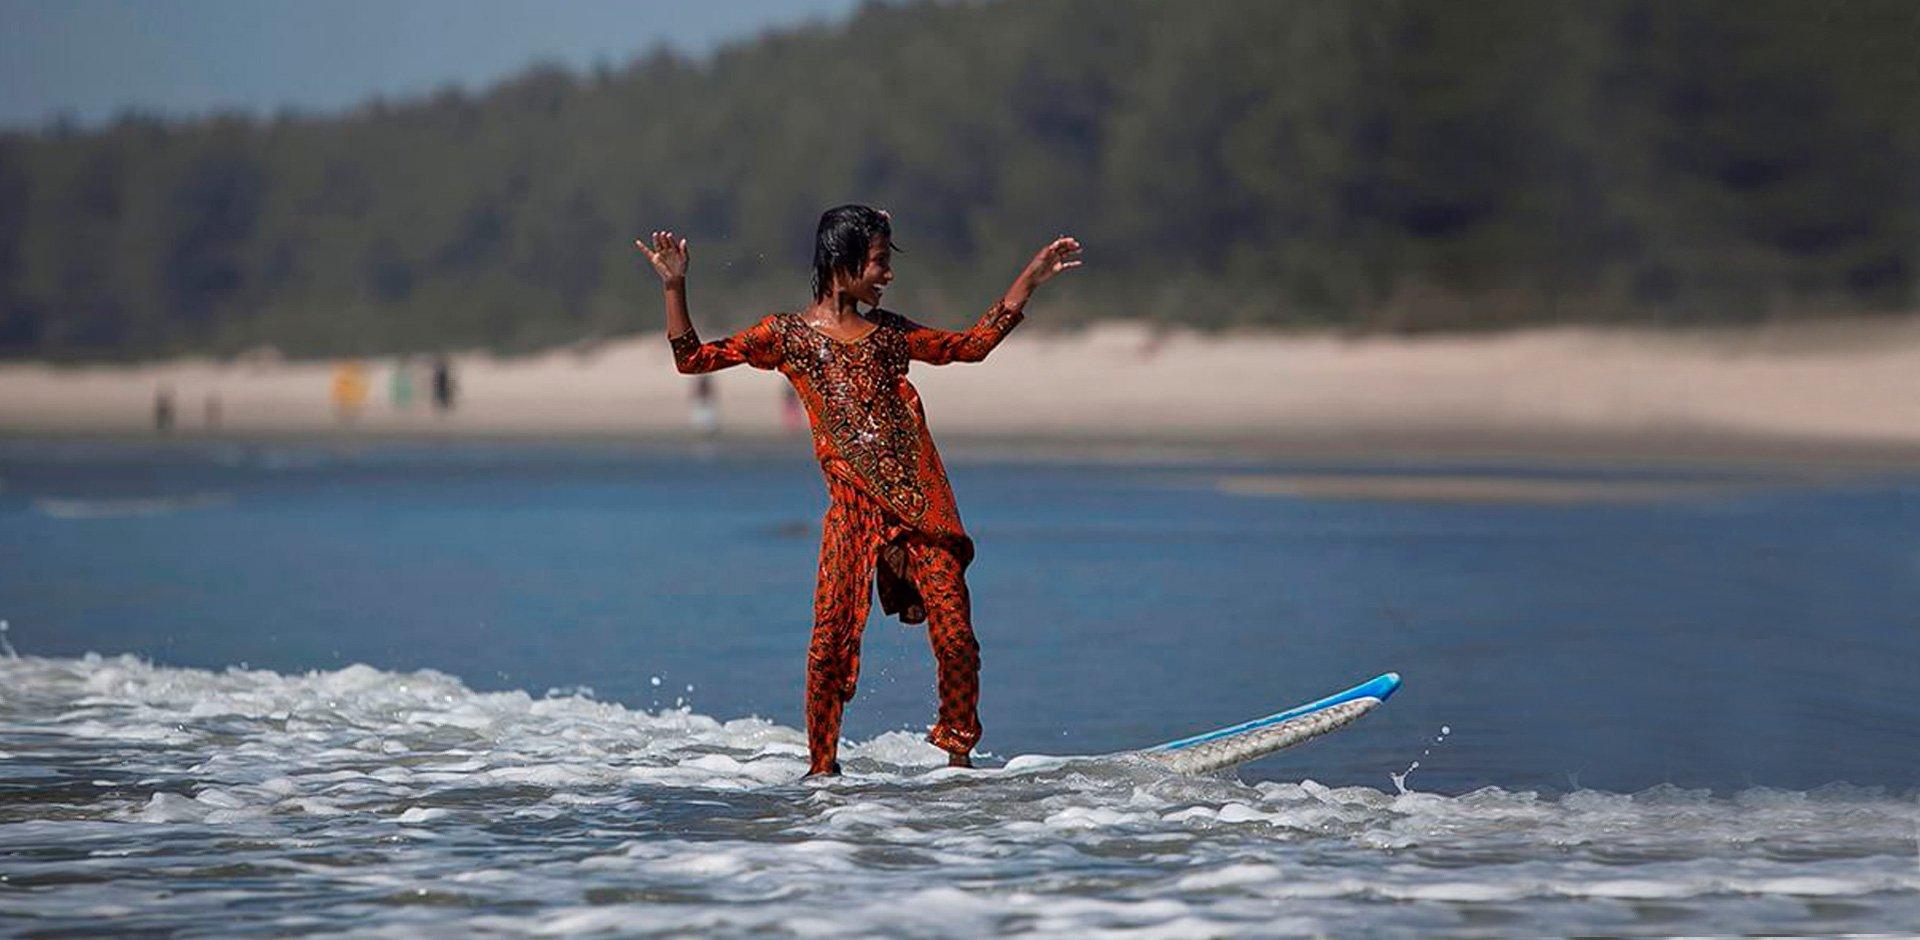 New Trend Bangladeshi Surf Girls By Photographer Allison